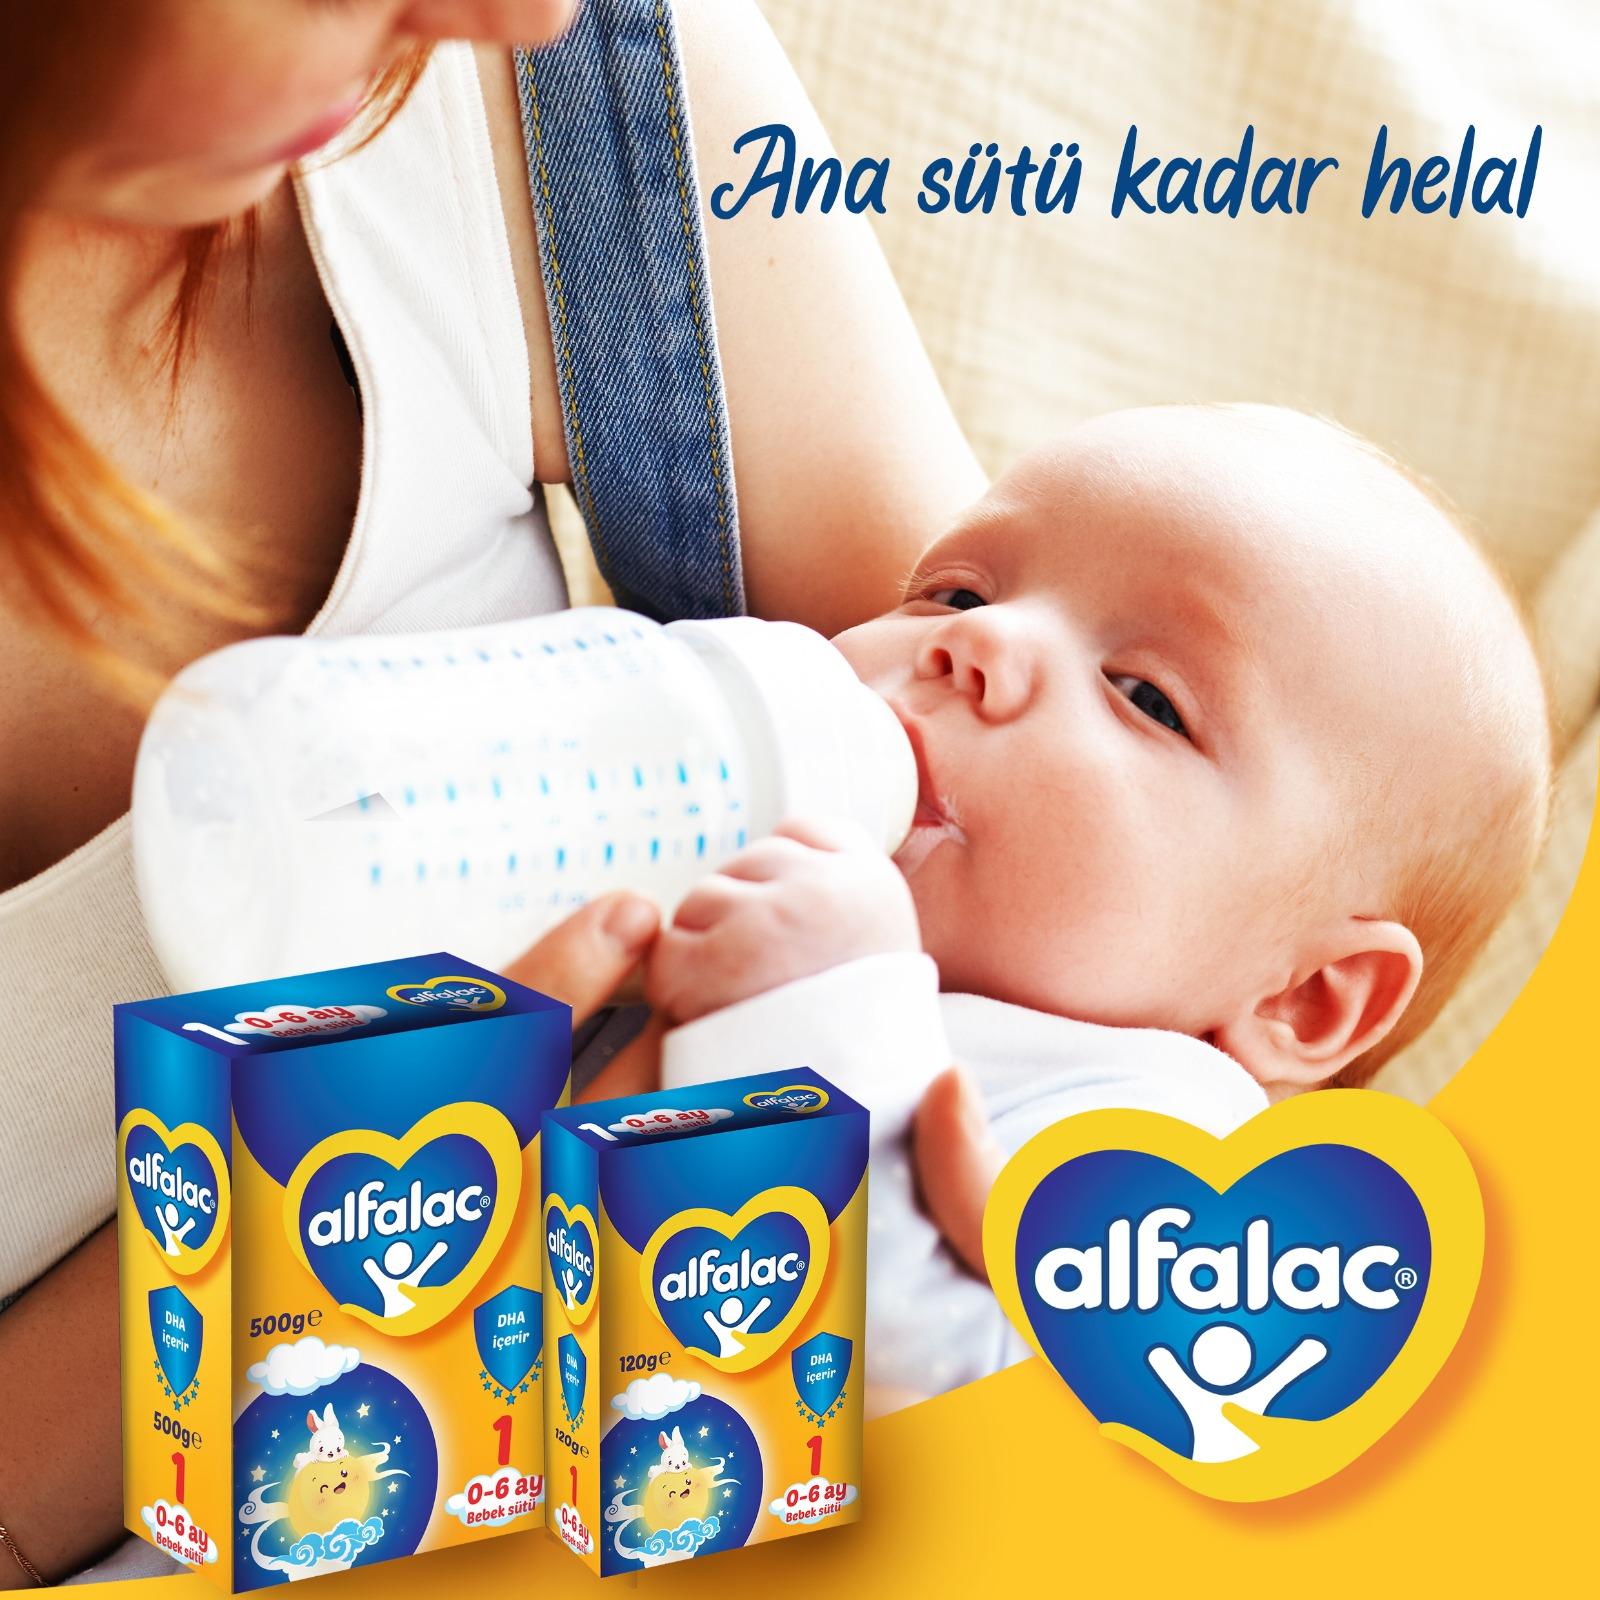 ALFALAC